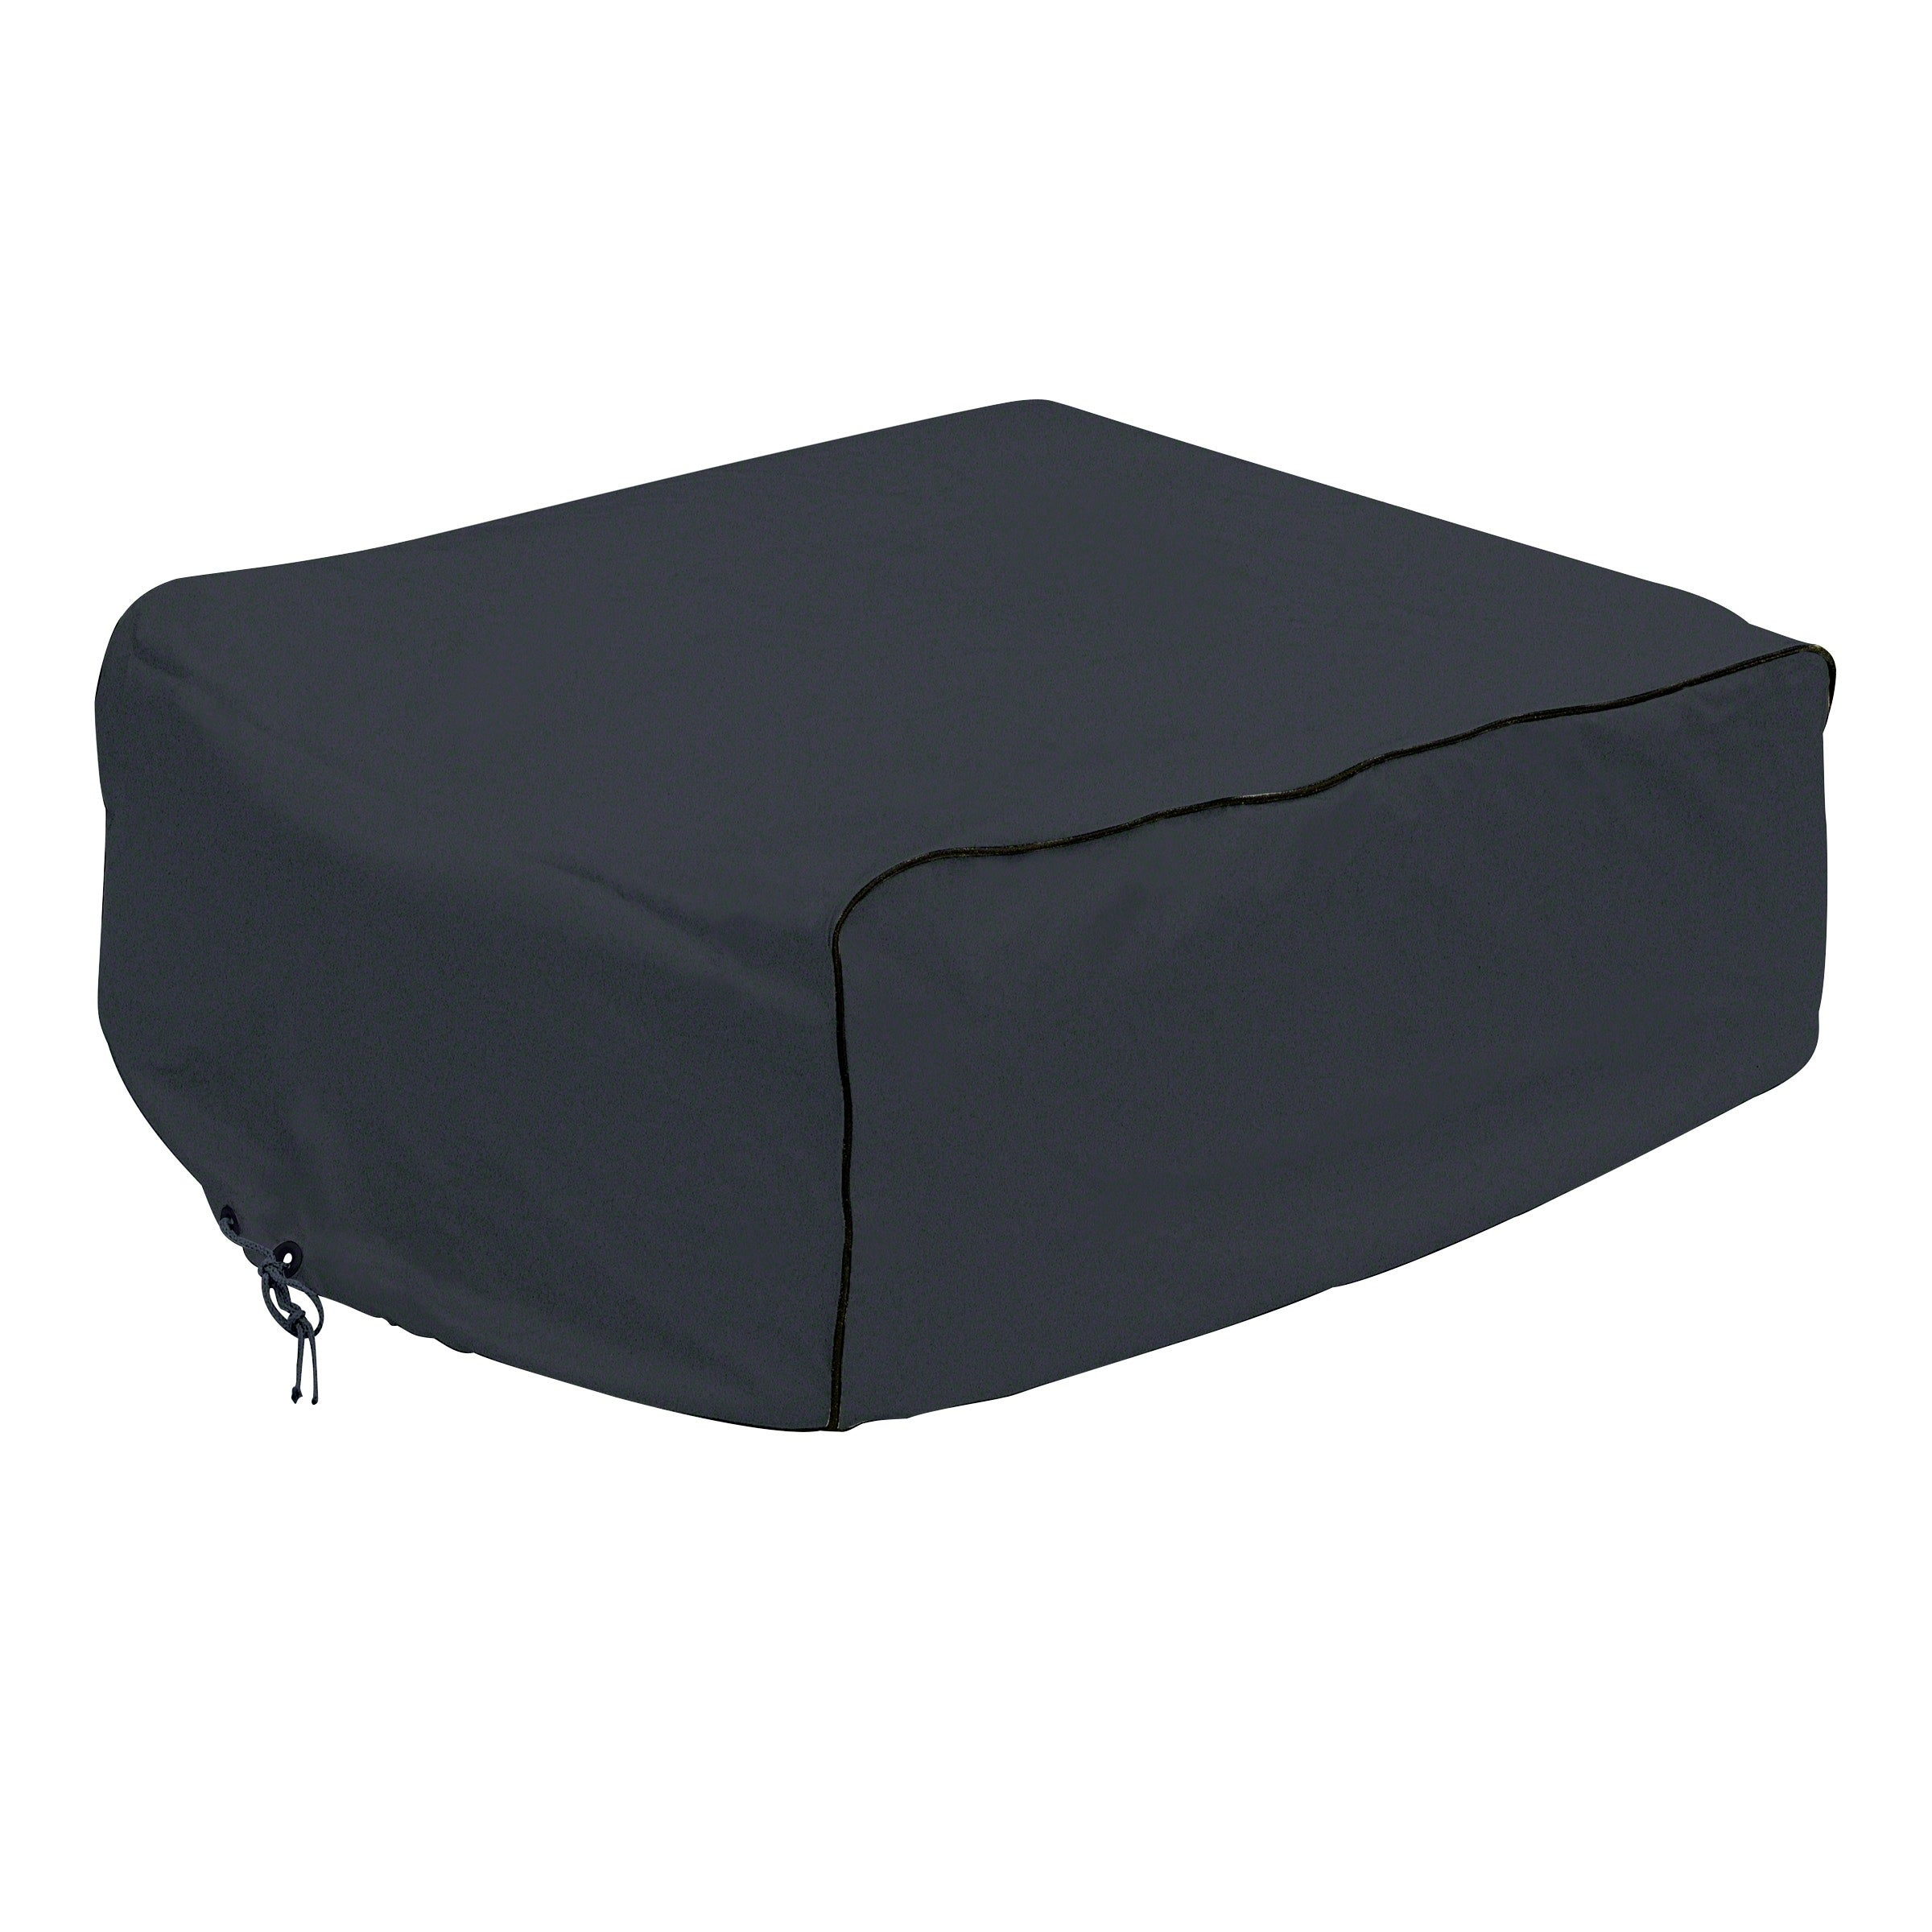 Classic 80-233-180401-00 RV Air Conditioner Cover, Black